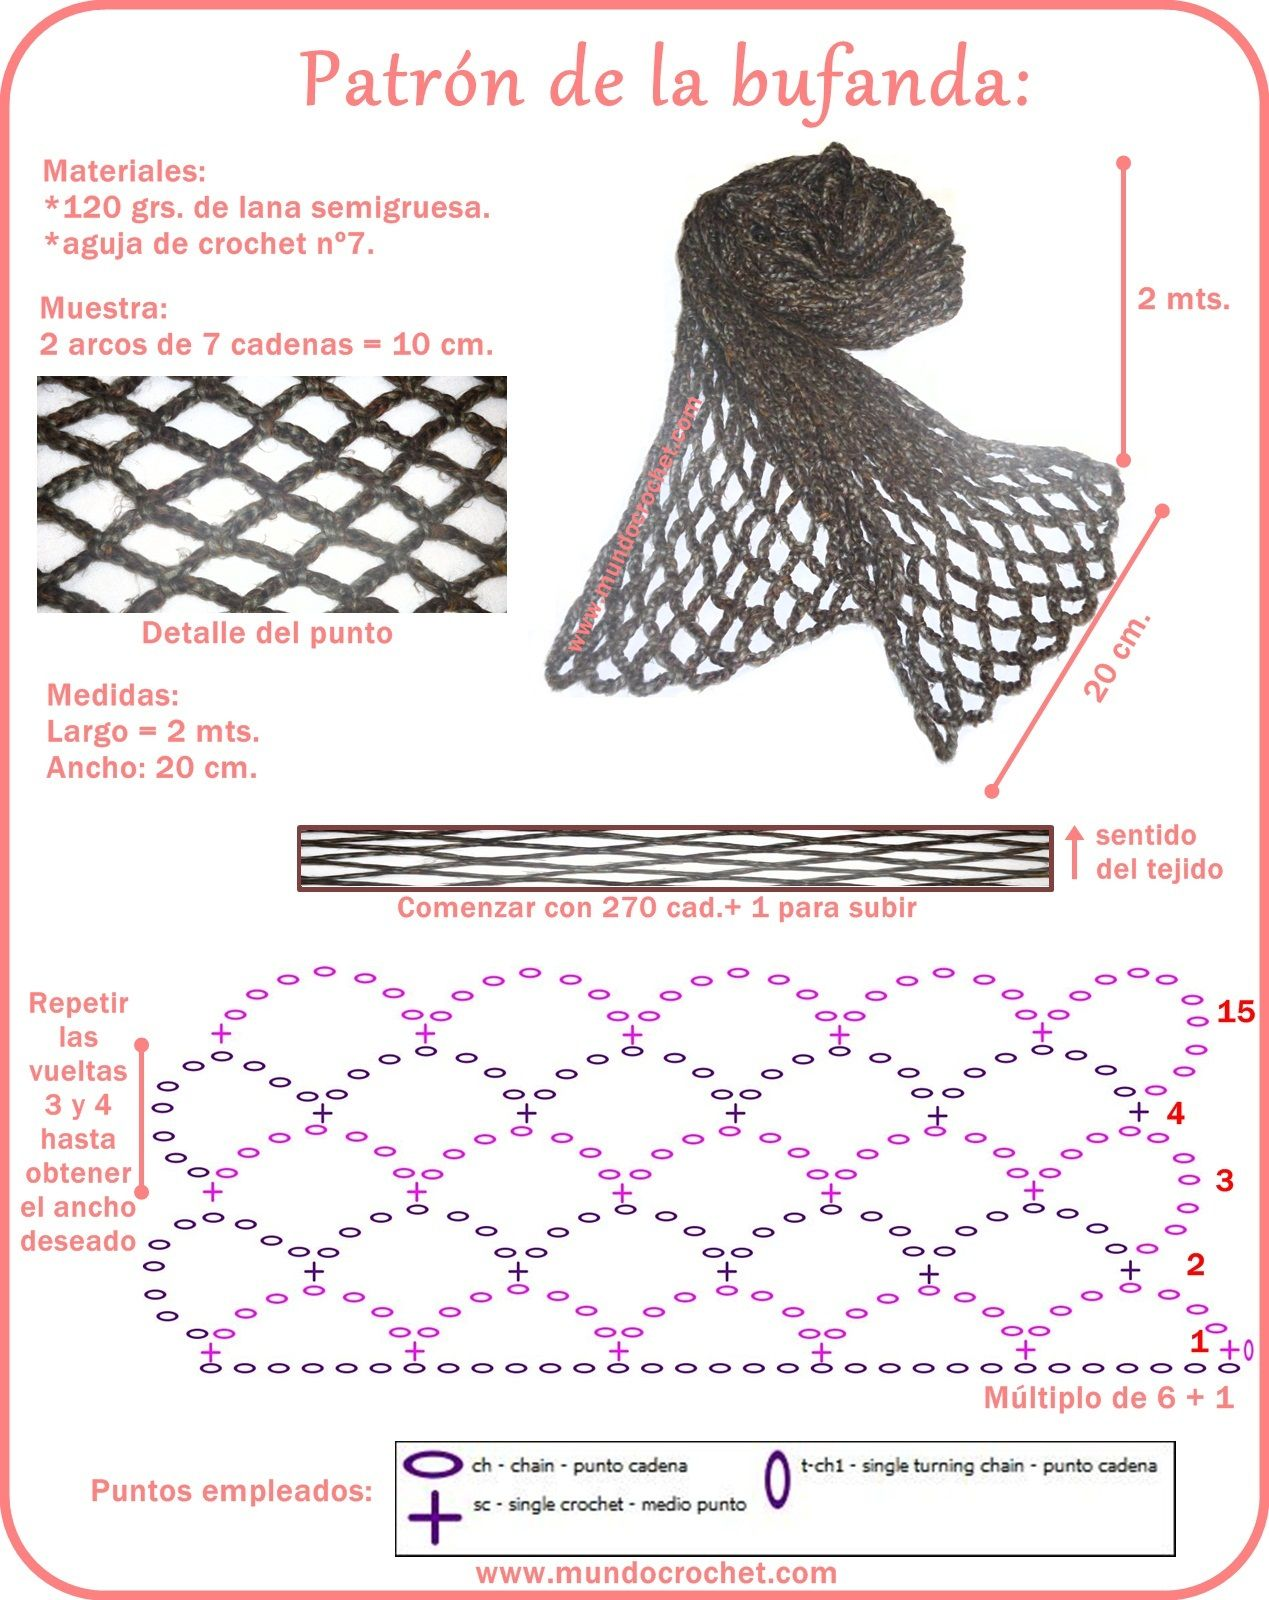 Bufanda sencilla en punto red - Mundo Crochet | goyesca | Pinterest ...